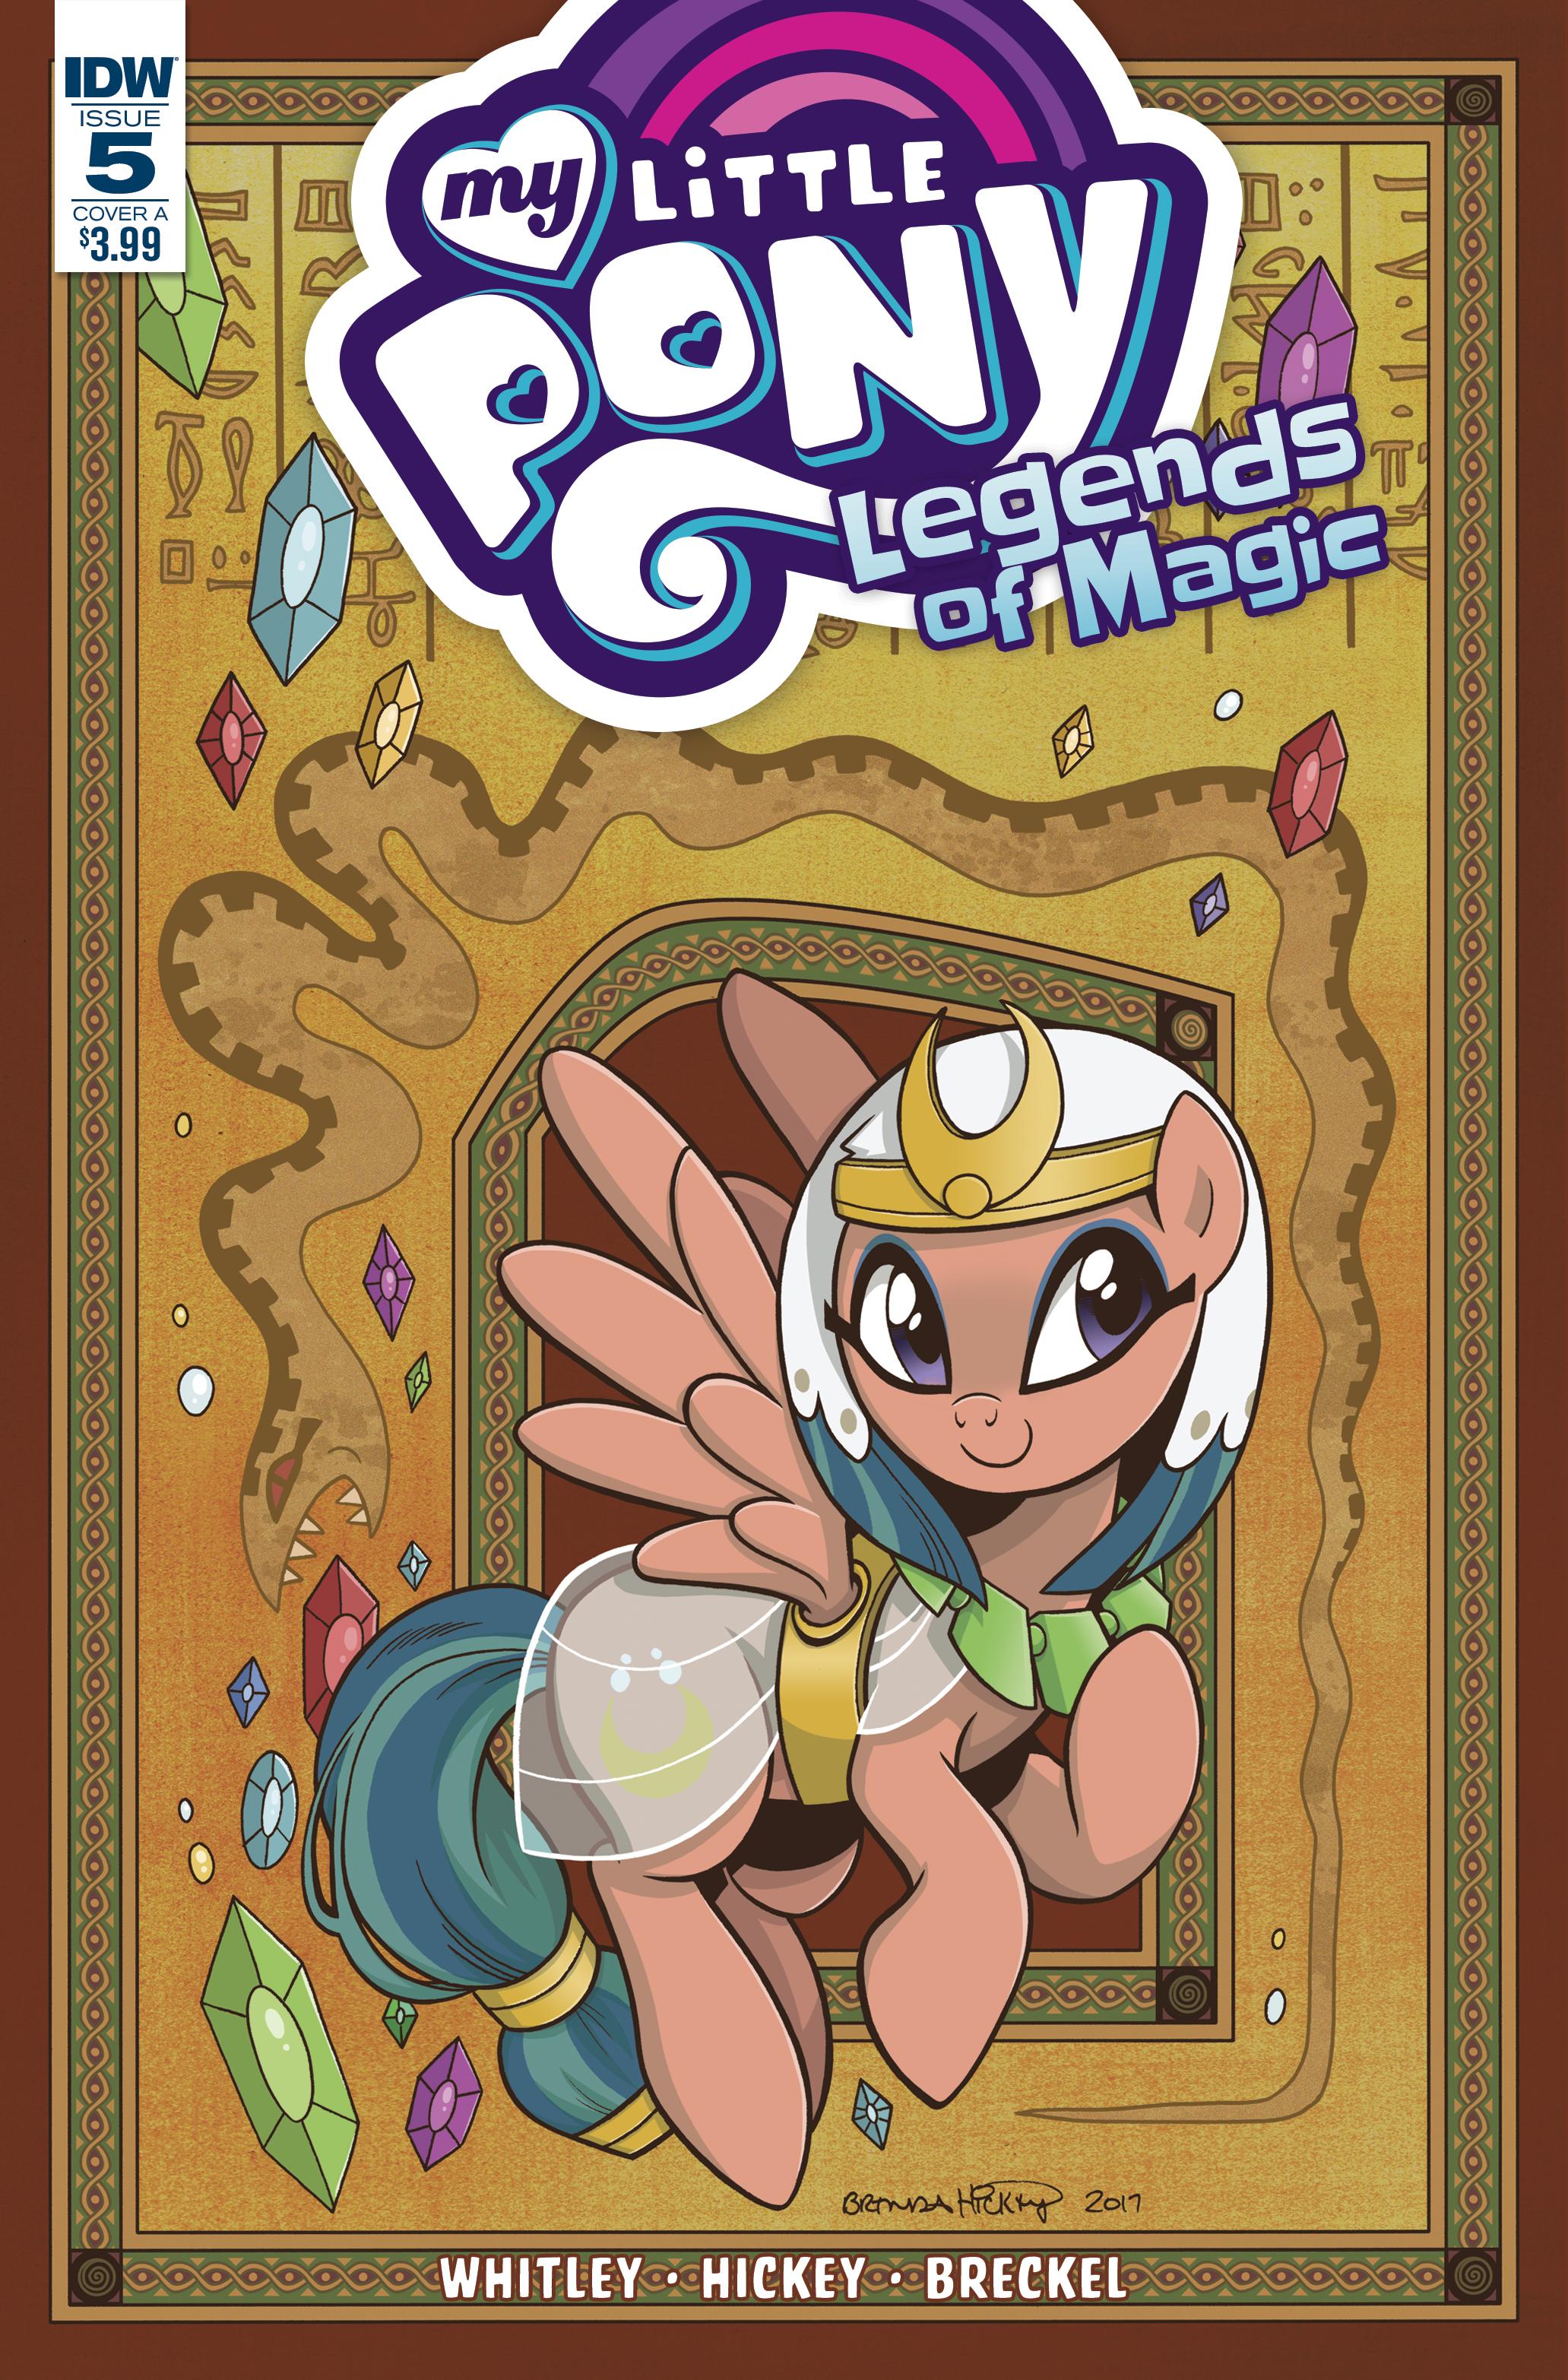 Legends of Magic Issue 5